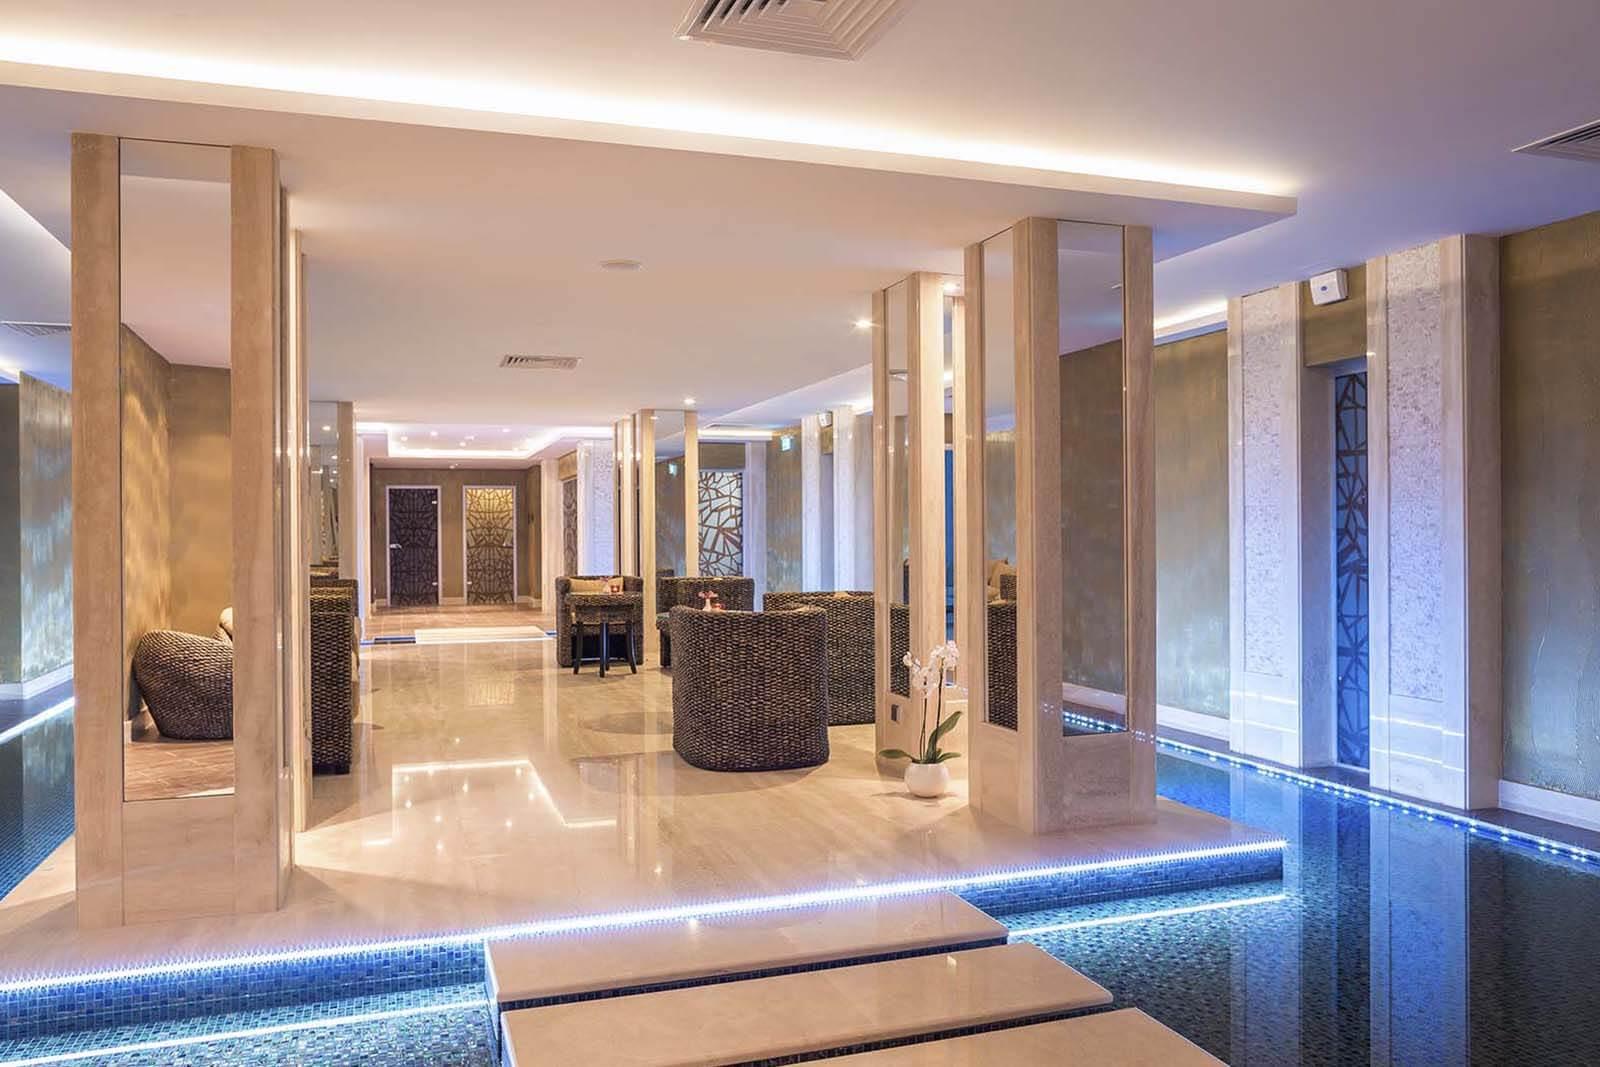 riviera-sunrise-alushta-hotel